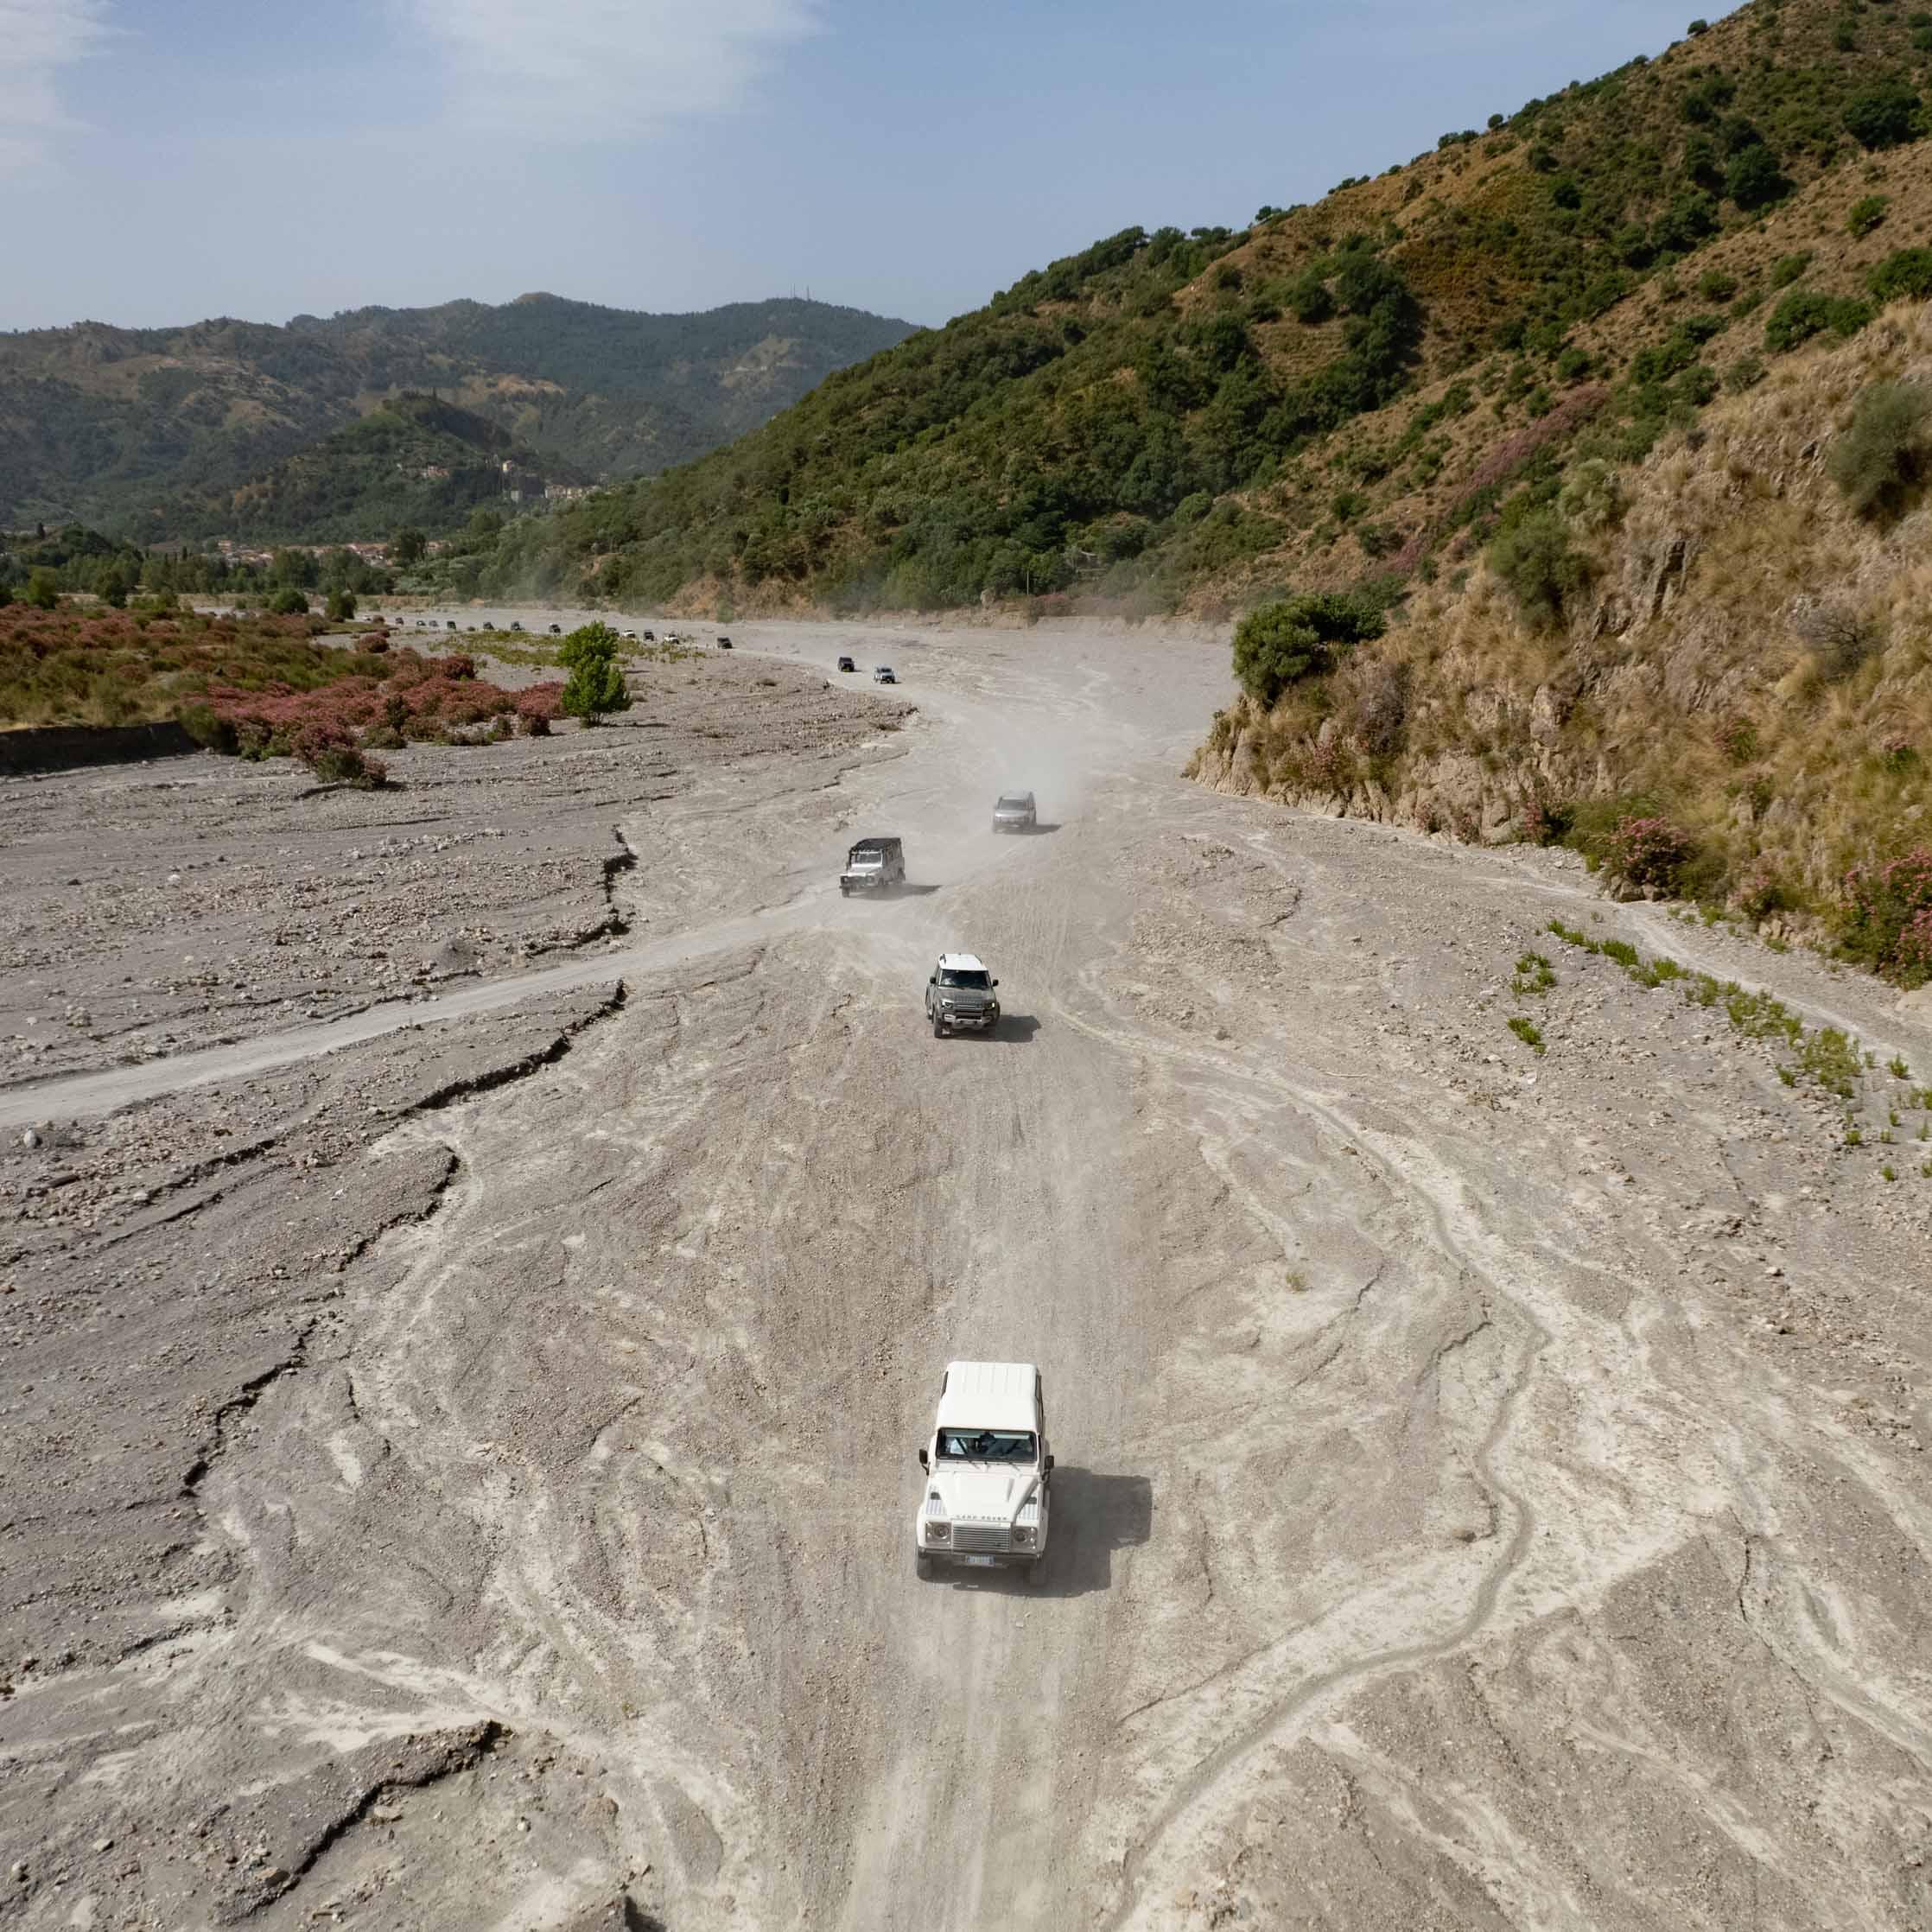 Land_Rover_Tour_Sicilia_2021_Land_Rover_Experience_Italia_-2